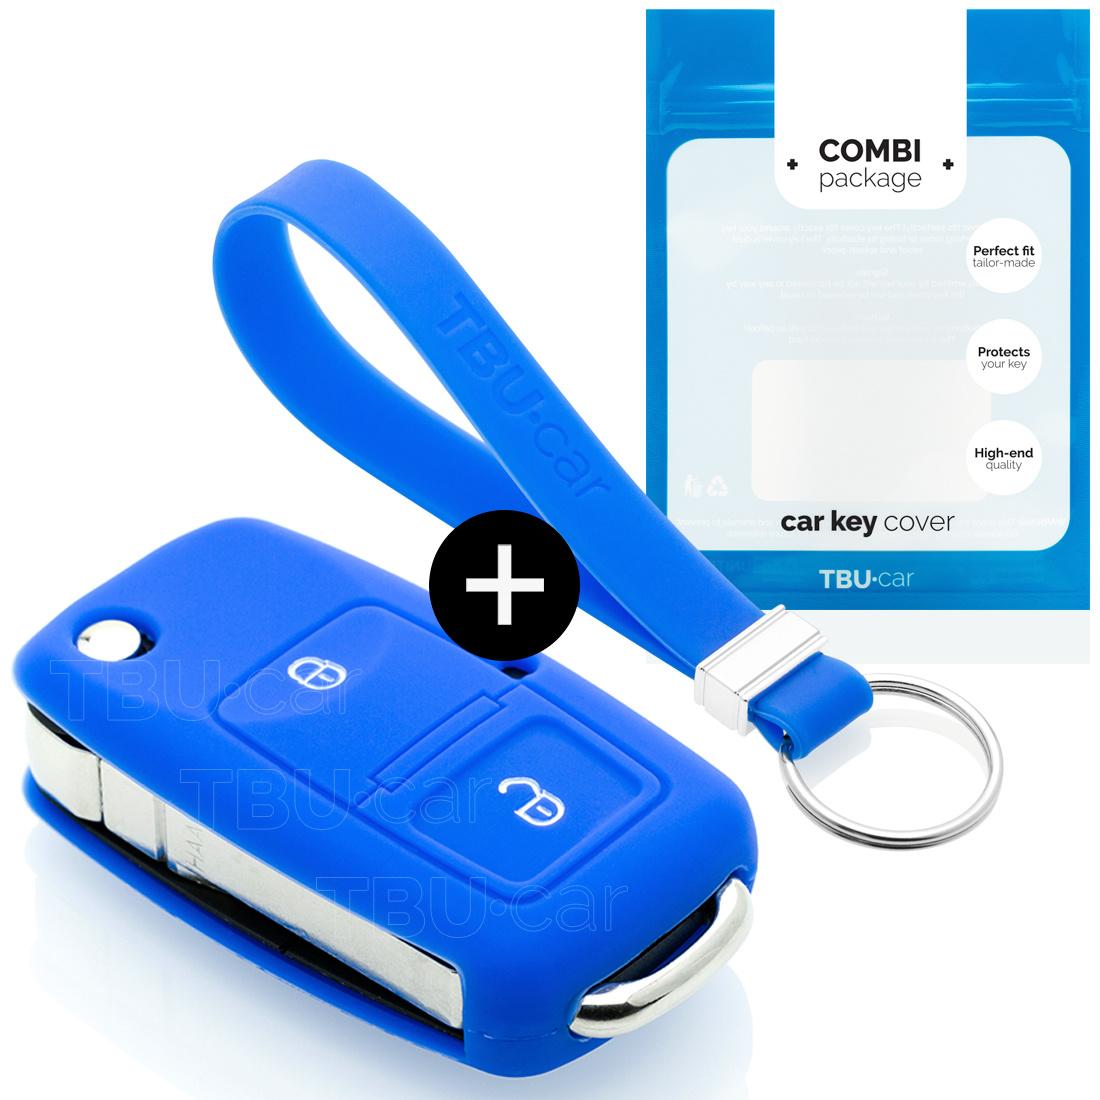 Volkswagen Autoschlüssel Hülle - Silikon Schutzhülle - Schlüsselhülle Cover - Blau